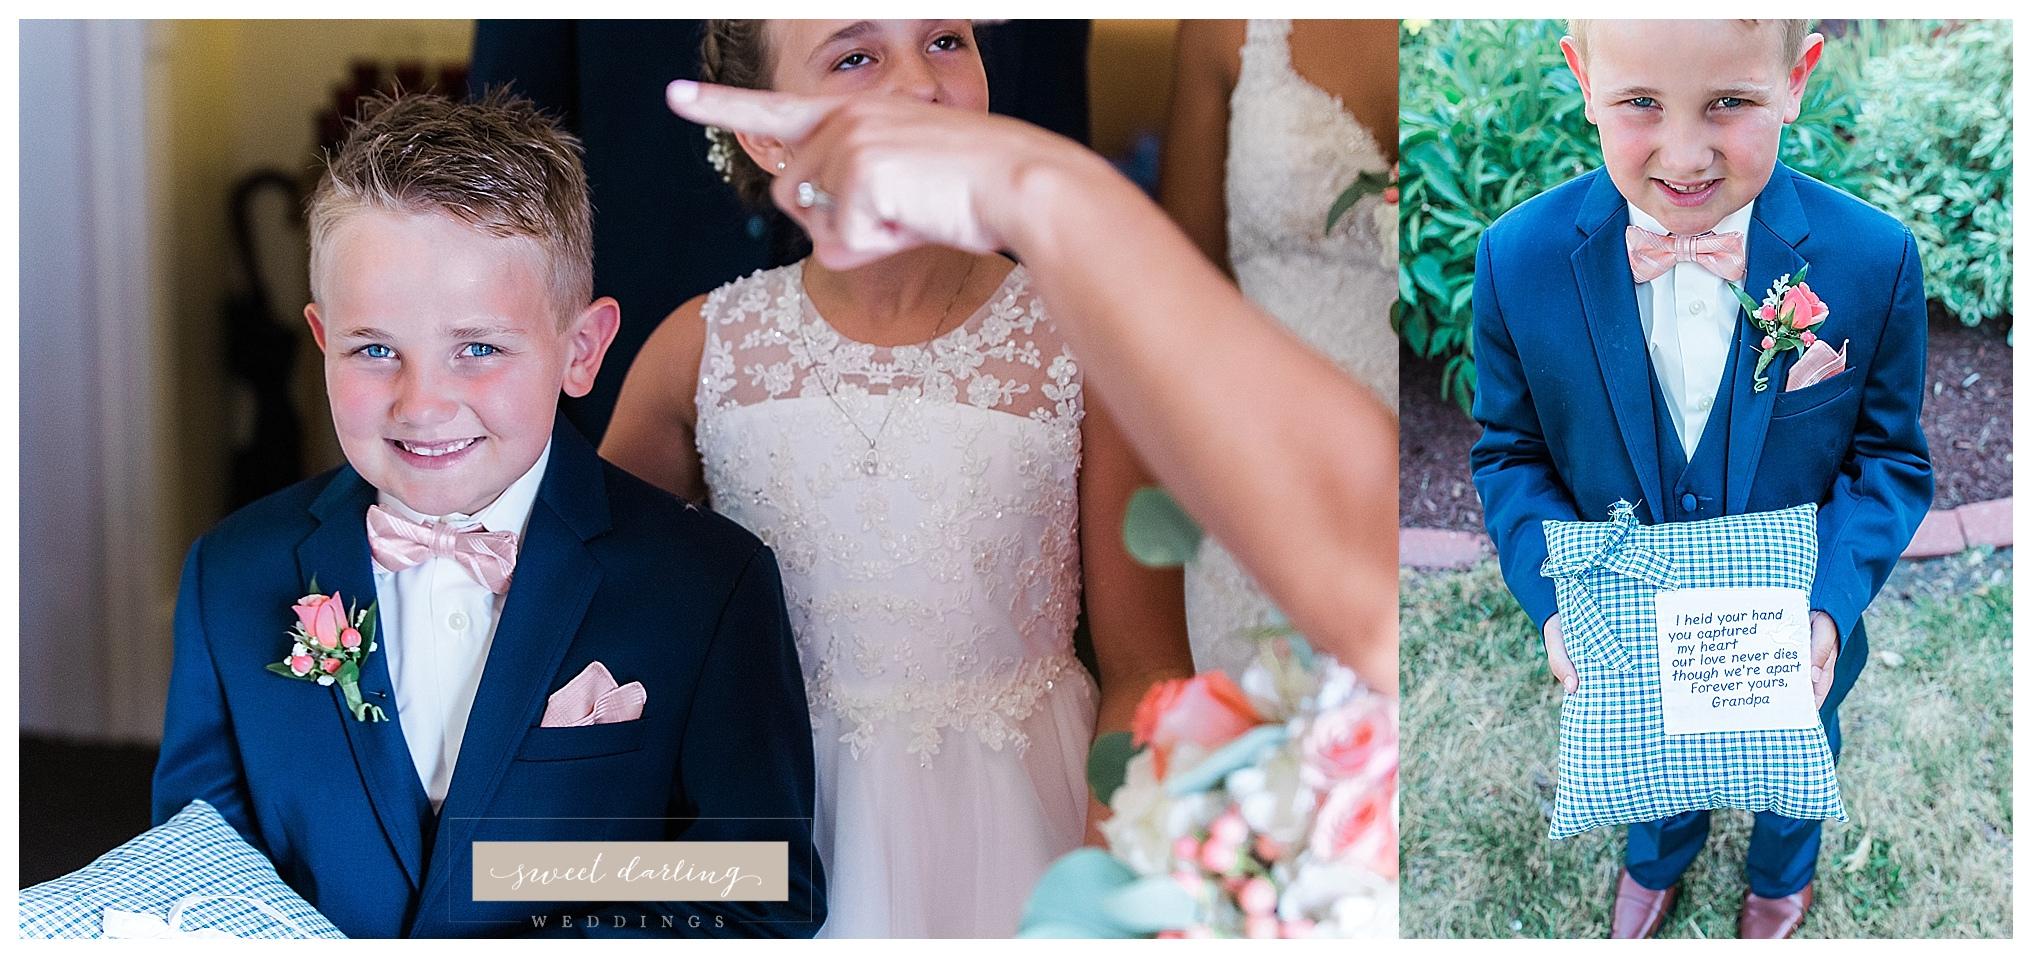 Rpaxton-illinois-engelbrecht-farm-country-wedding-photographer-sweet-darling-weddings_1264.jpg